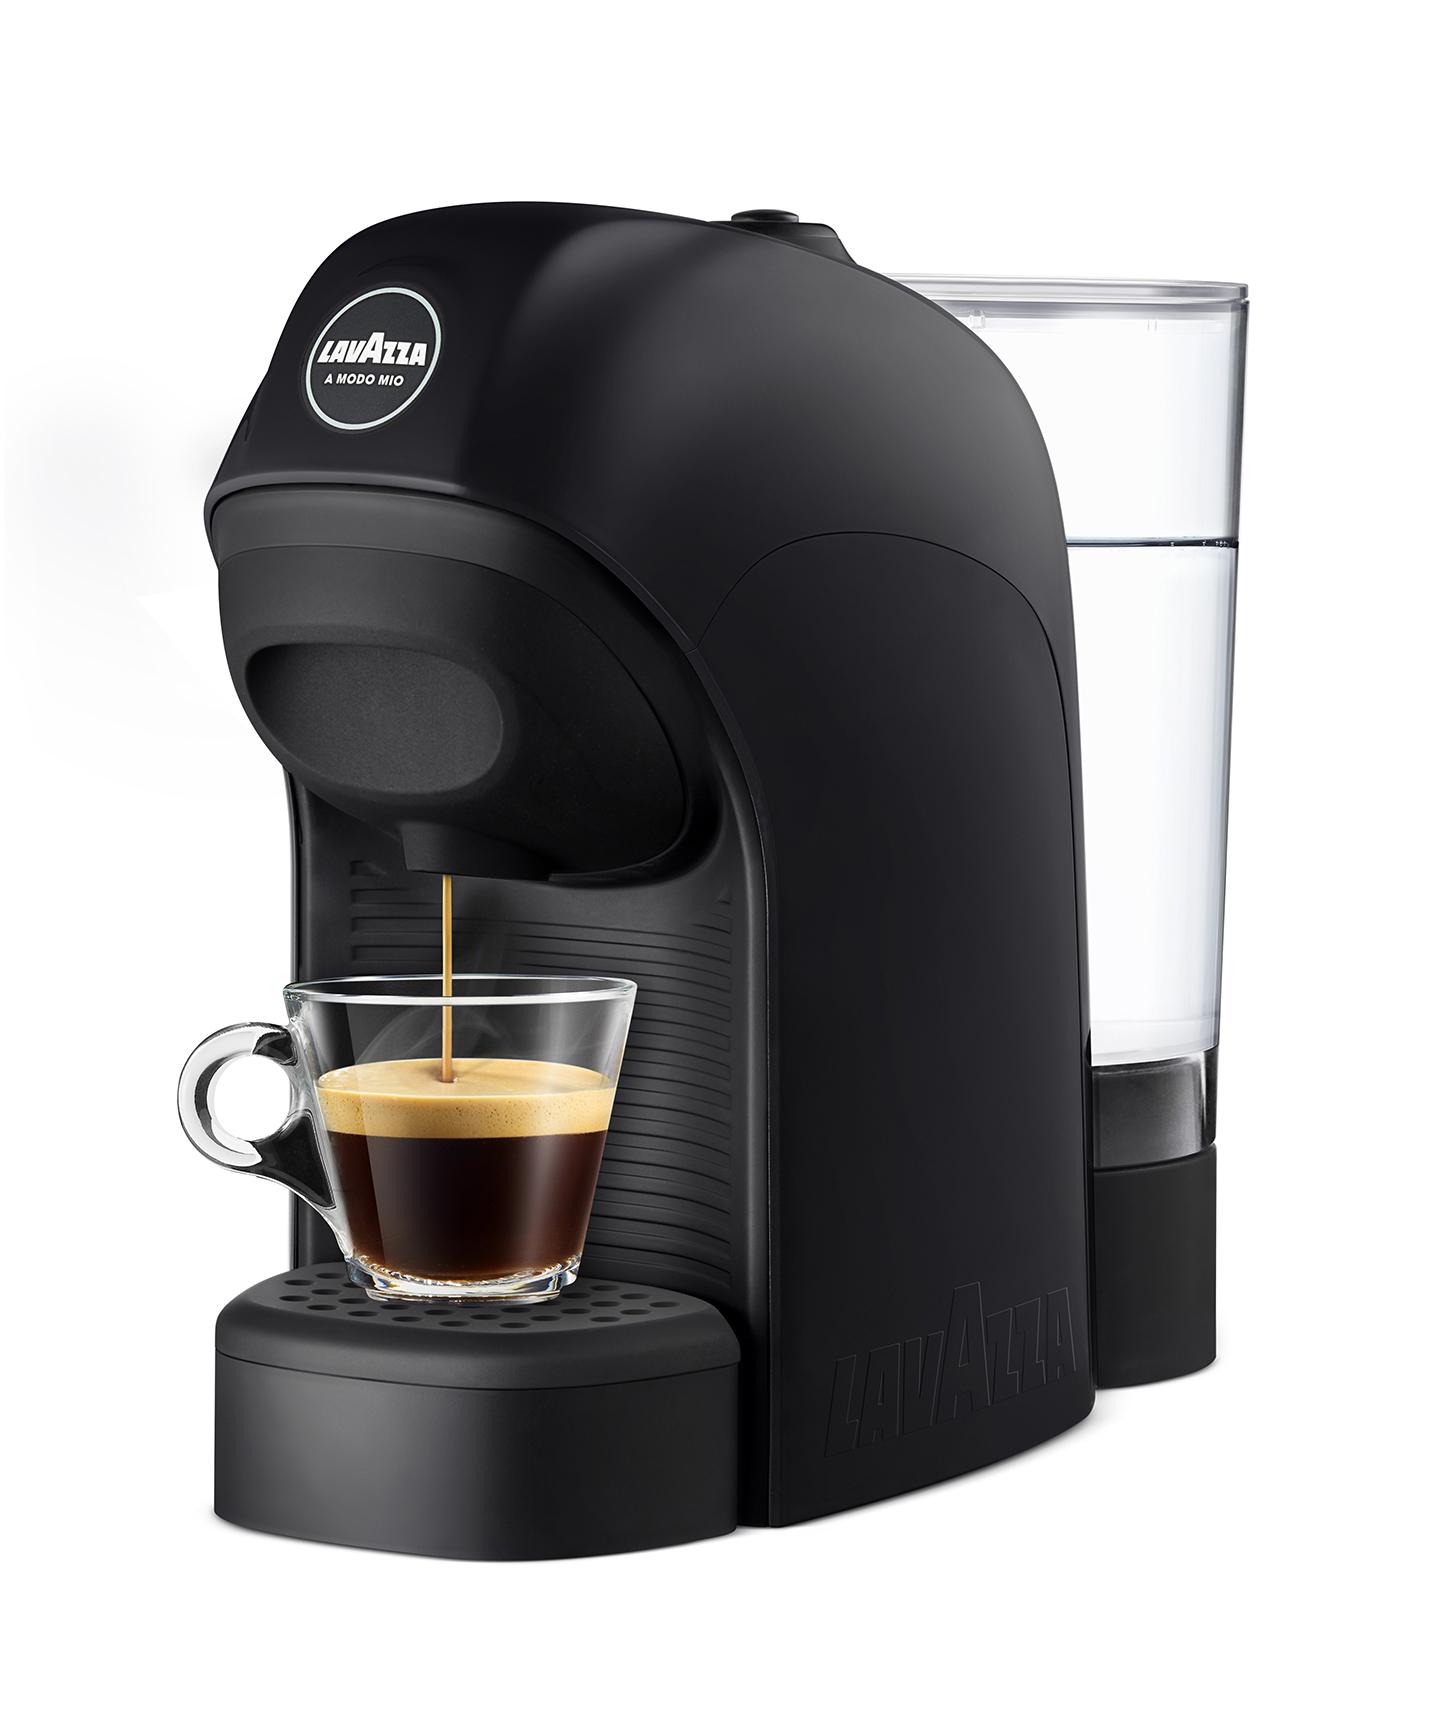 Lavazza LM800 Tiny Semi-automatica Macchina per caffè a cialde 0,75 L